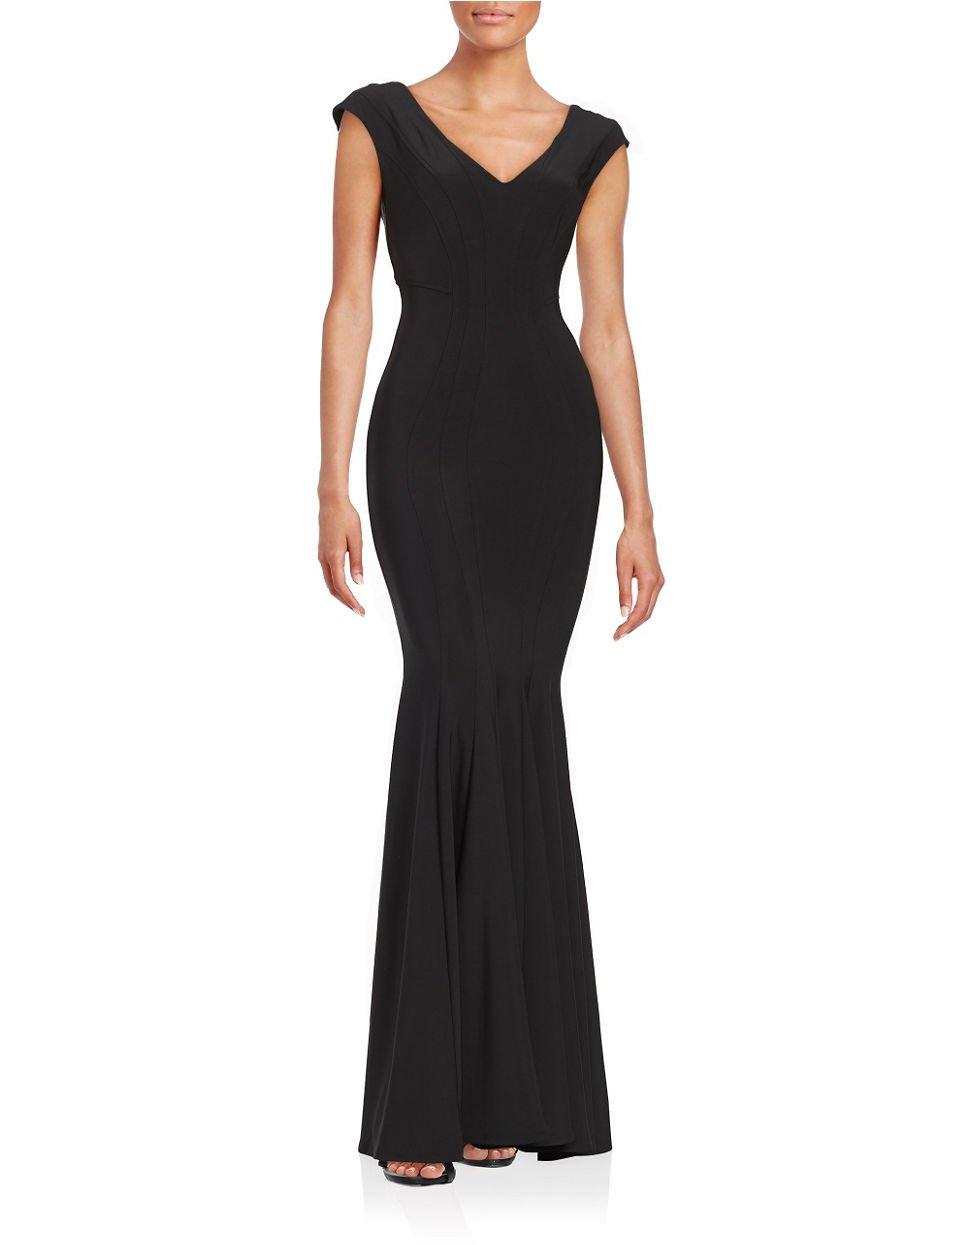 BETSY & ADAM Knit Trumpet Gown BLACK Size 2 #100 NEW | eBay